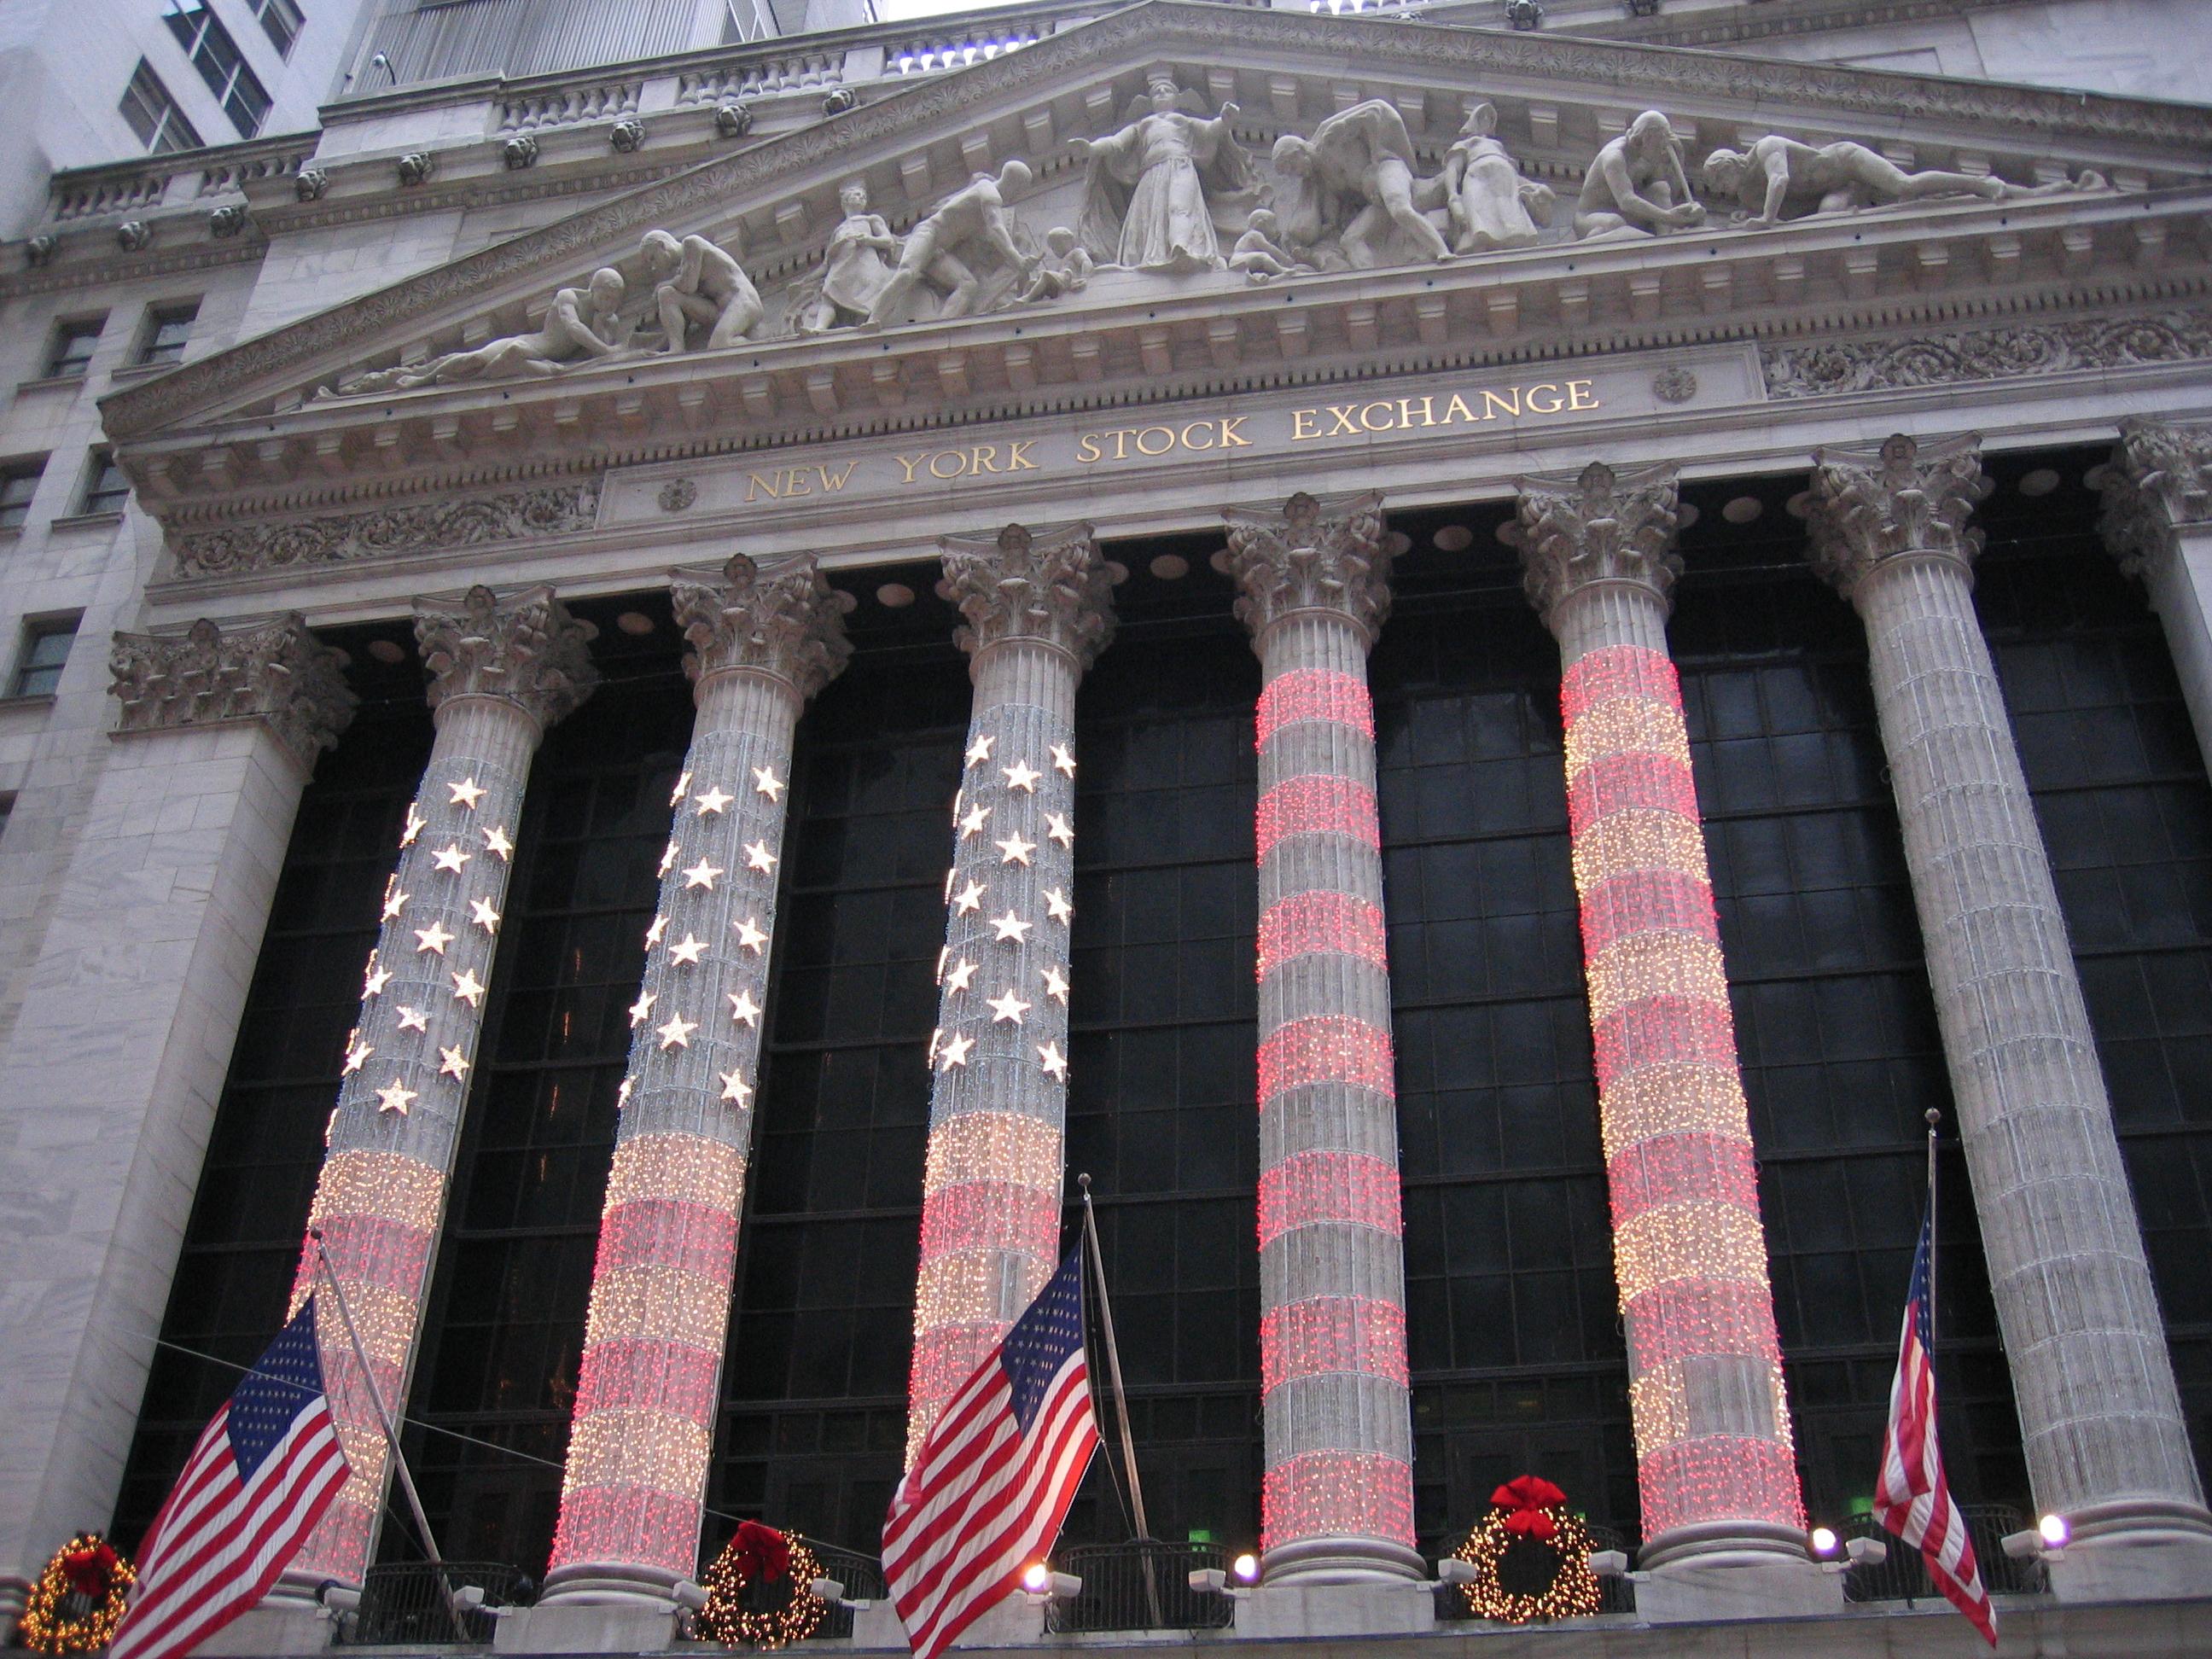 http://upload.wikimedia.org/wikipedia/commons/b/b2/NYSE_Xmas_Time.JPG